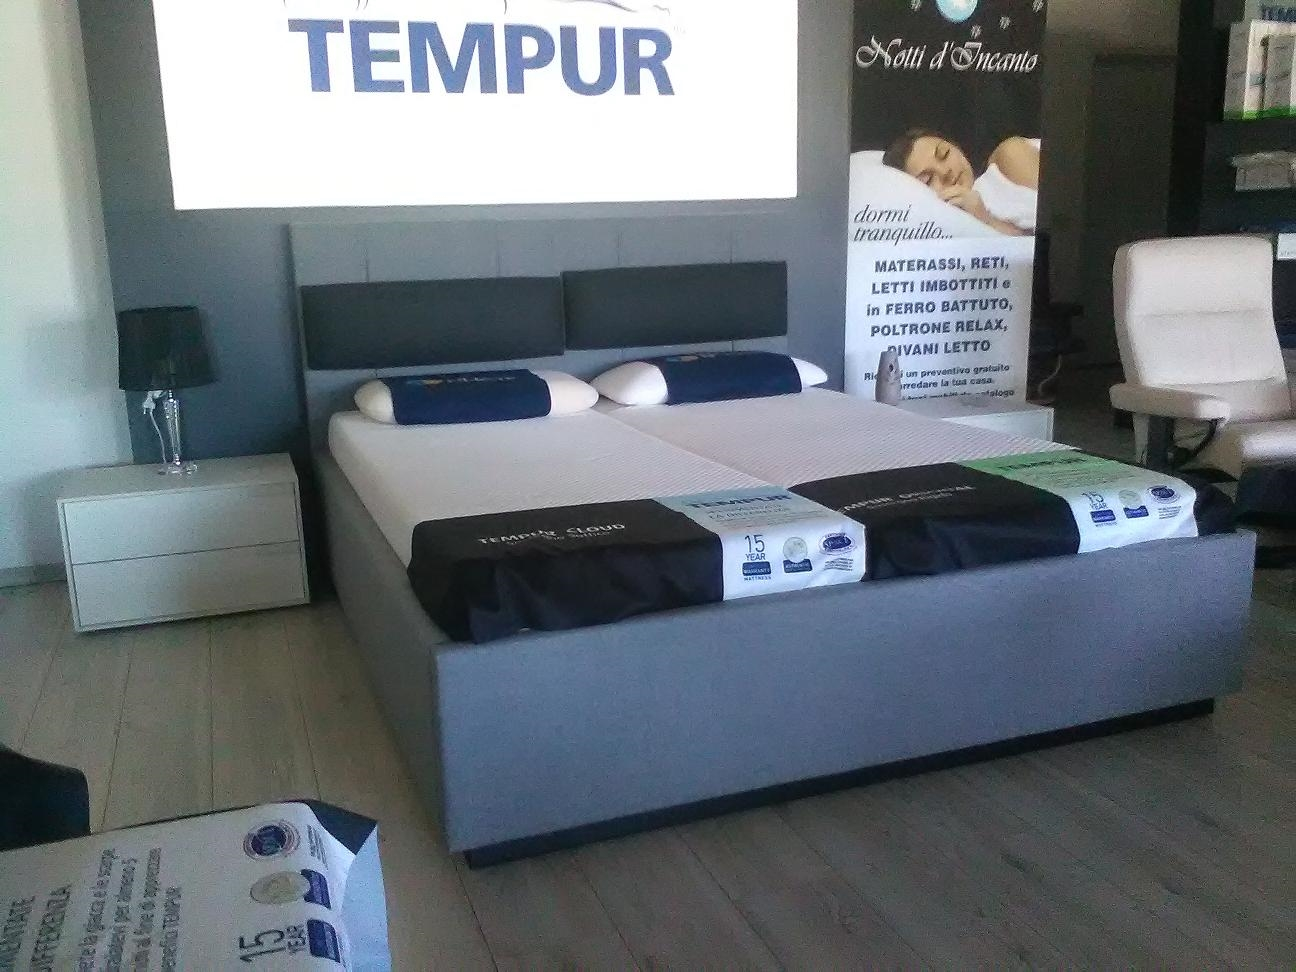 Letto tempur tempur matrimoniale design letti a prezzi for Letto matrimoniale design